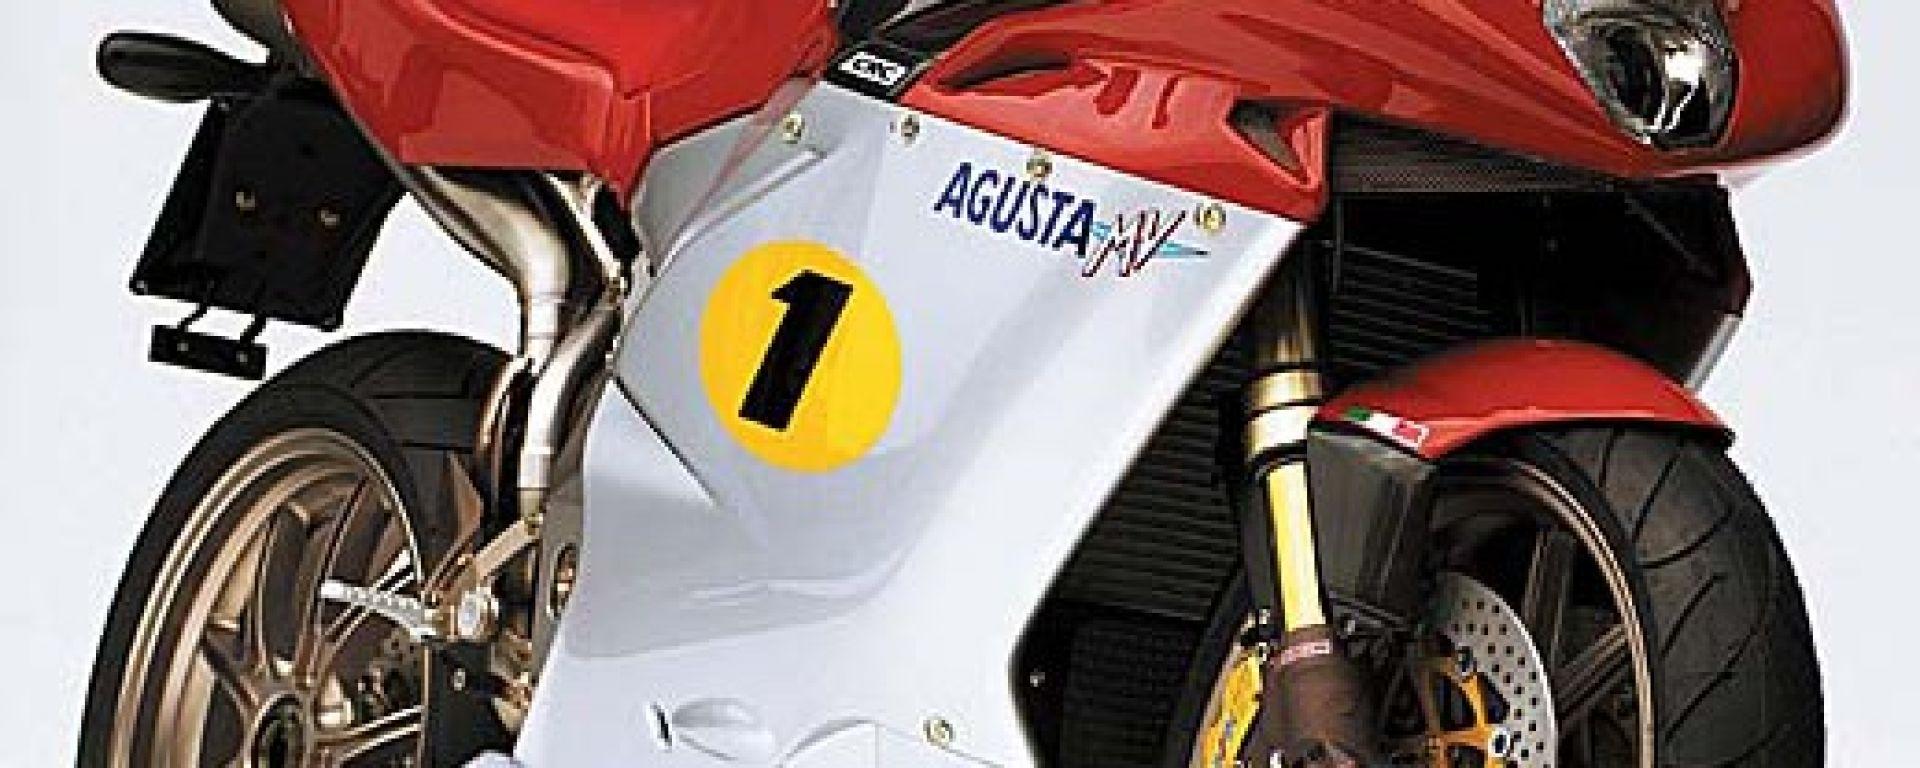 MV Agusta F4 Ago